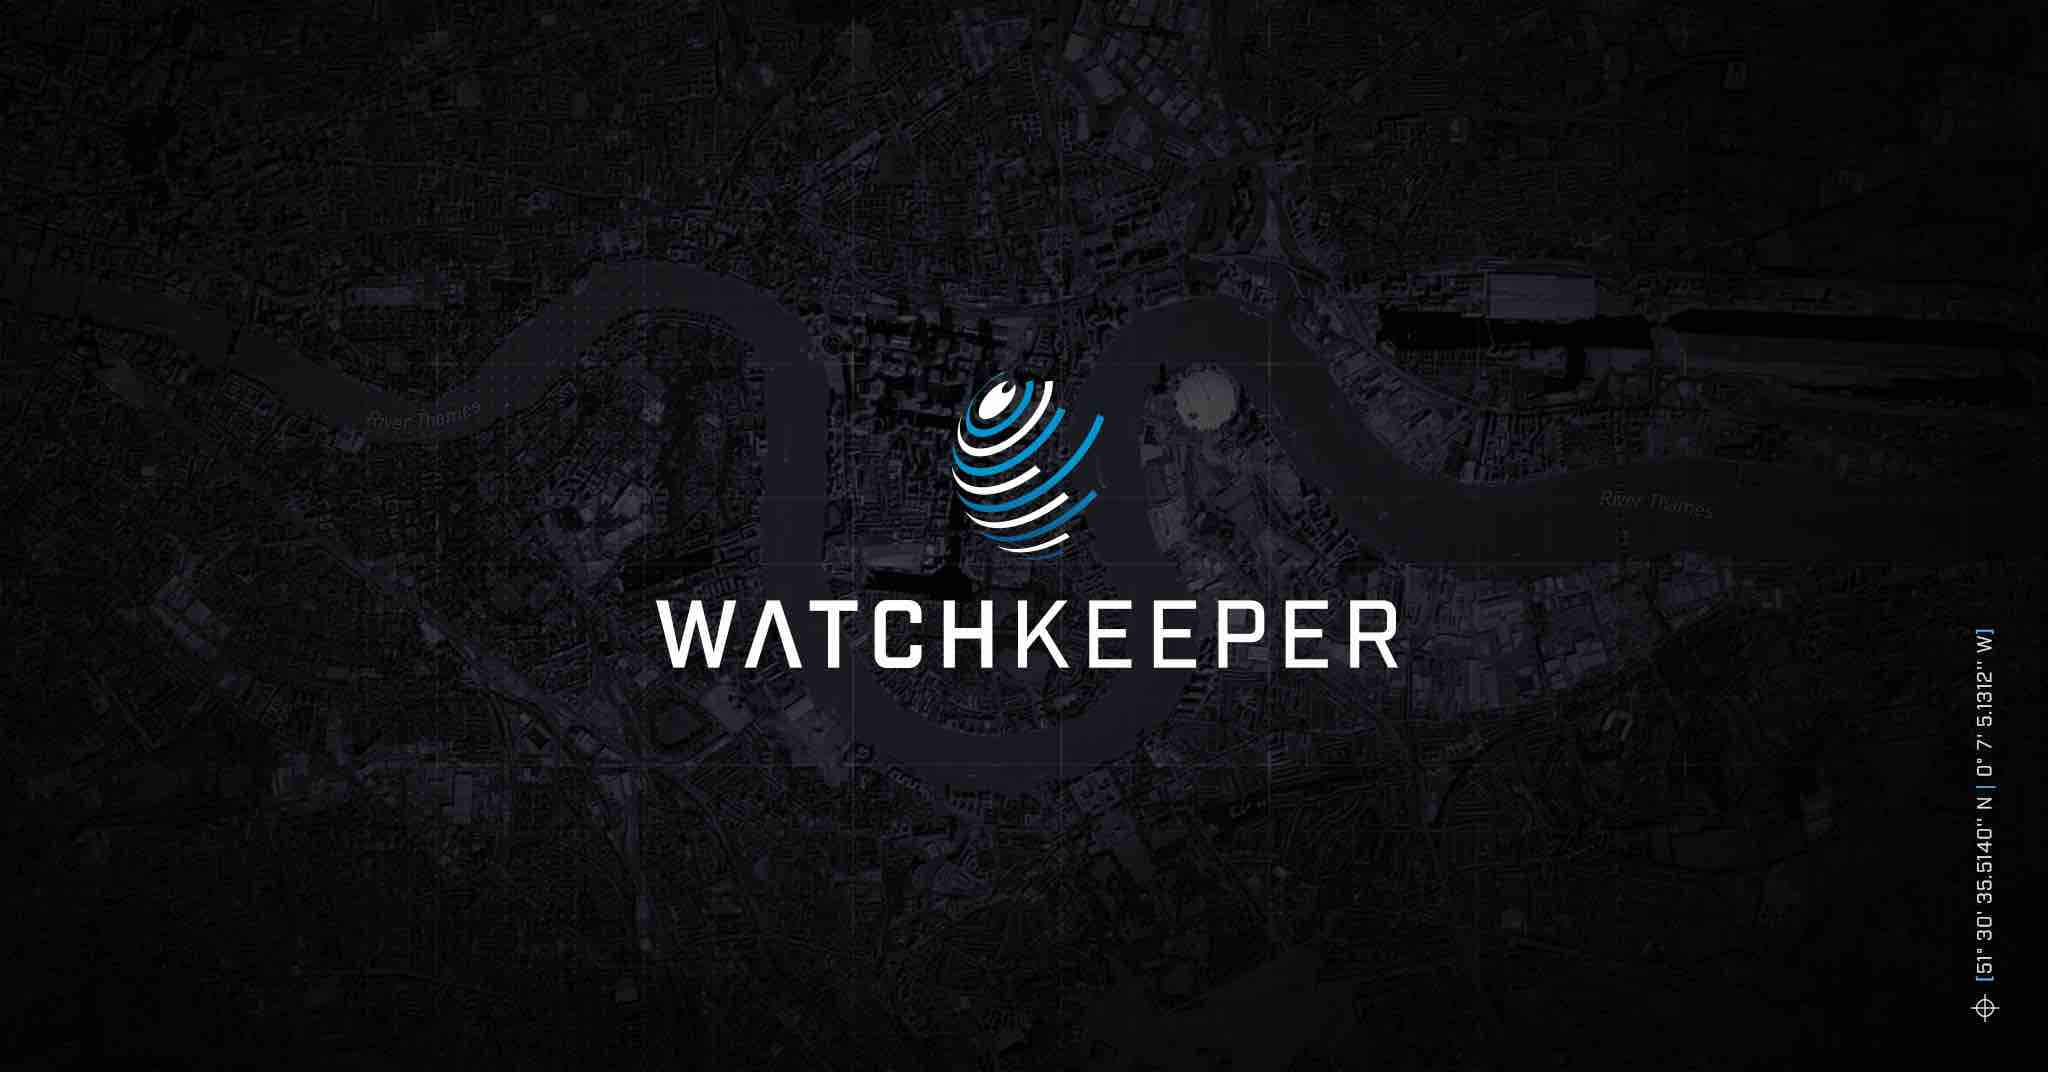 WatchKeeper